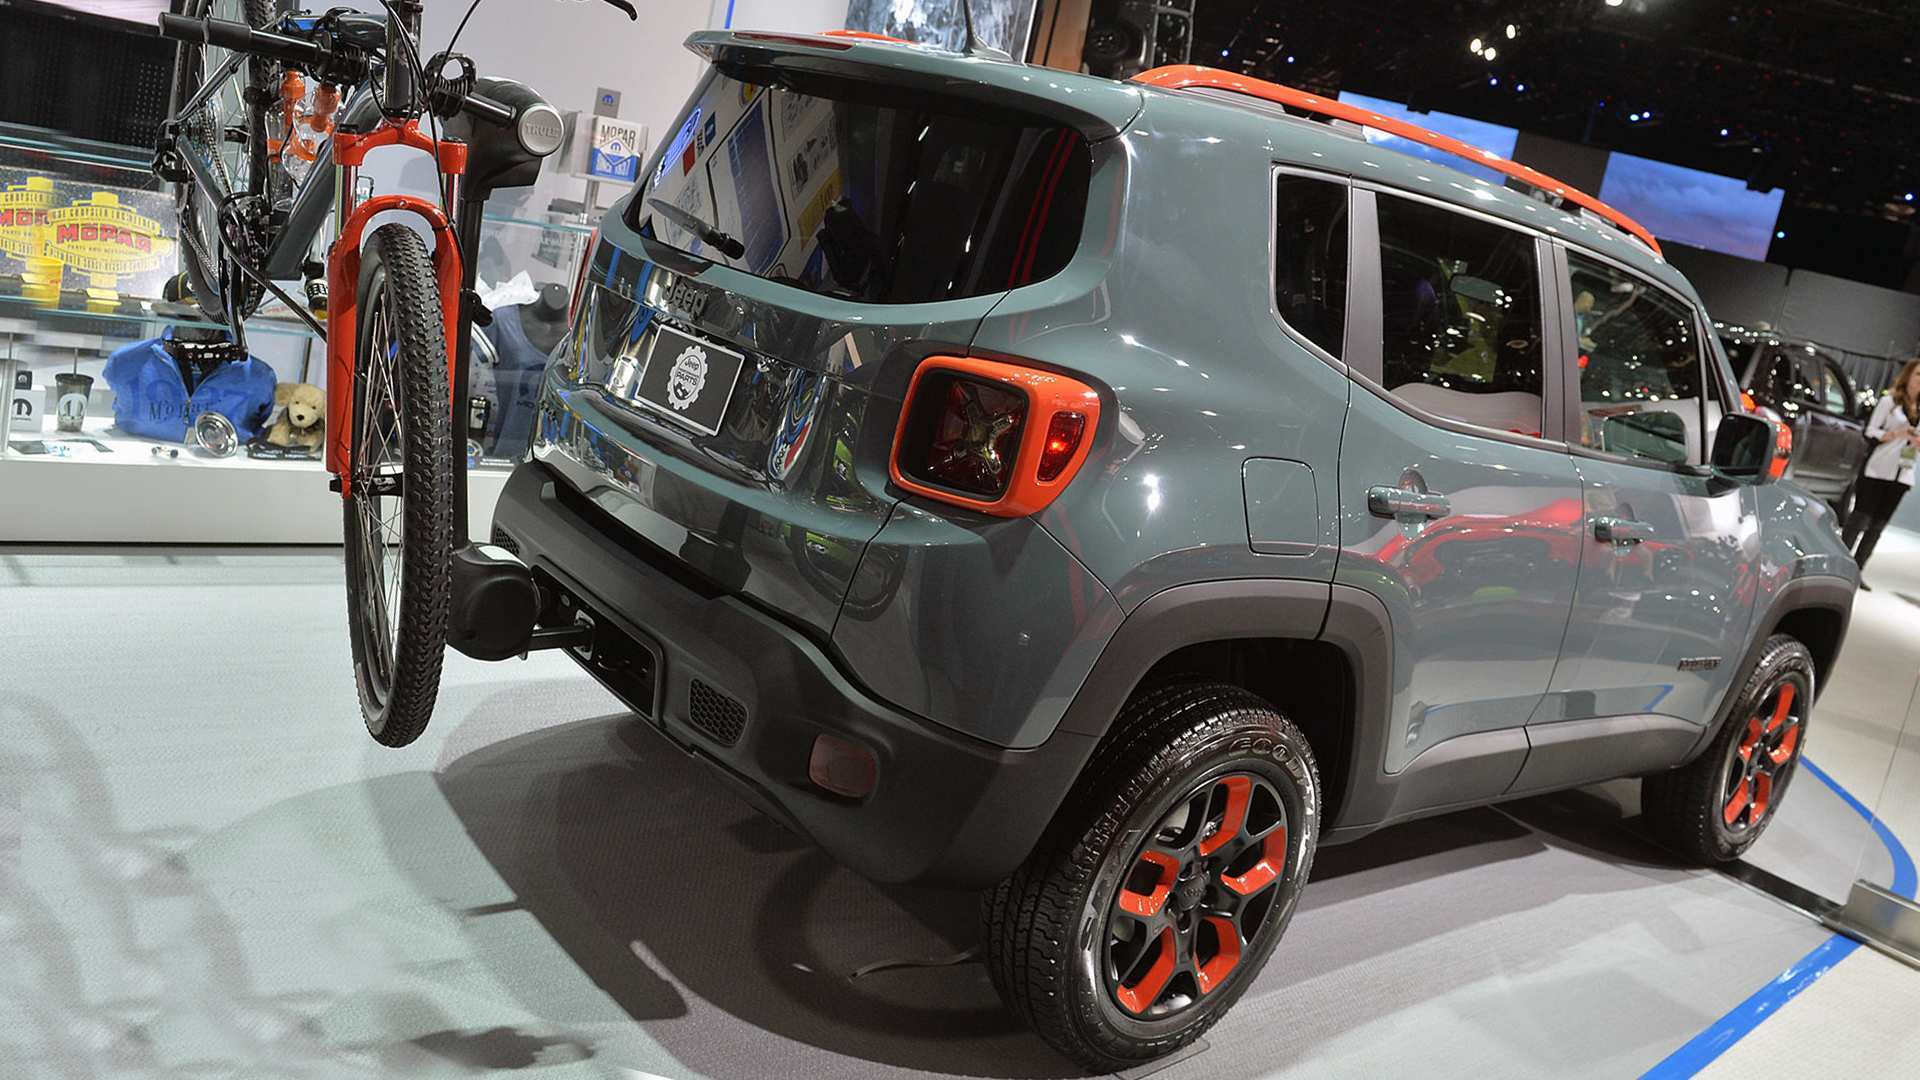 57 All New Jeep Turbo Diesel 2019 Interior Speed Test with Jeep Turbo Diesel 2019 Interior